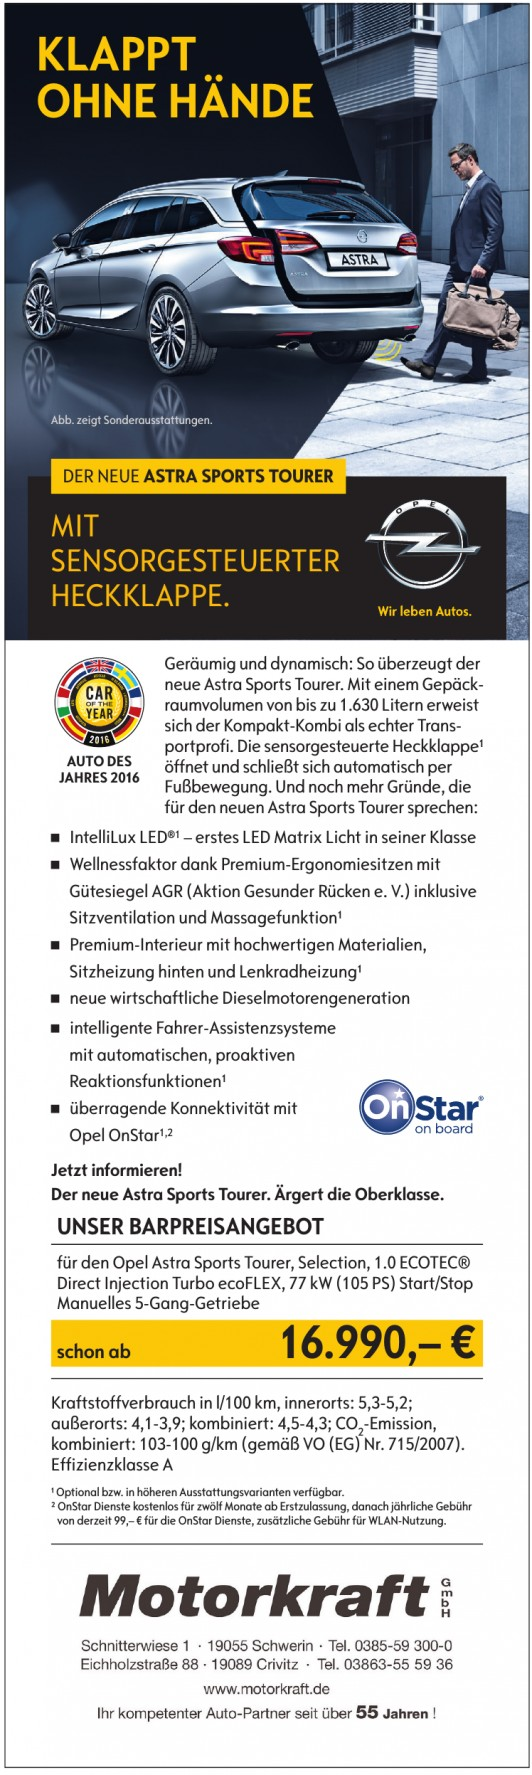 Motorkraft GmbH